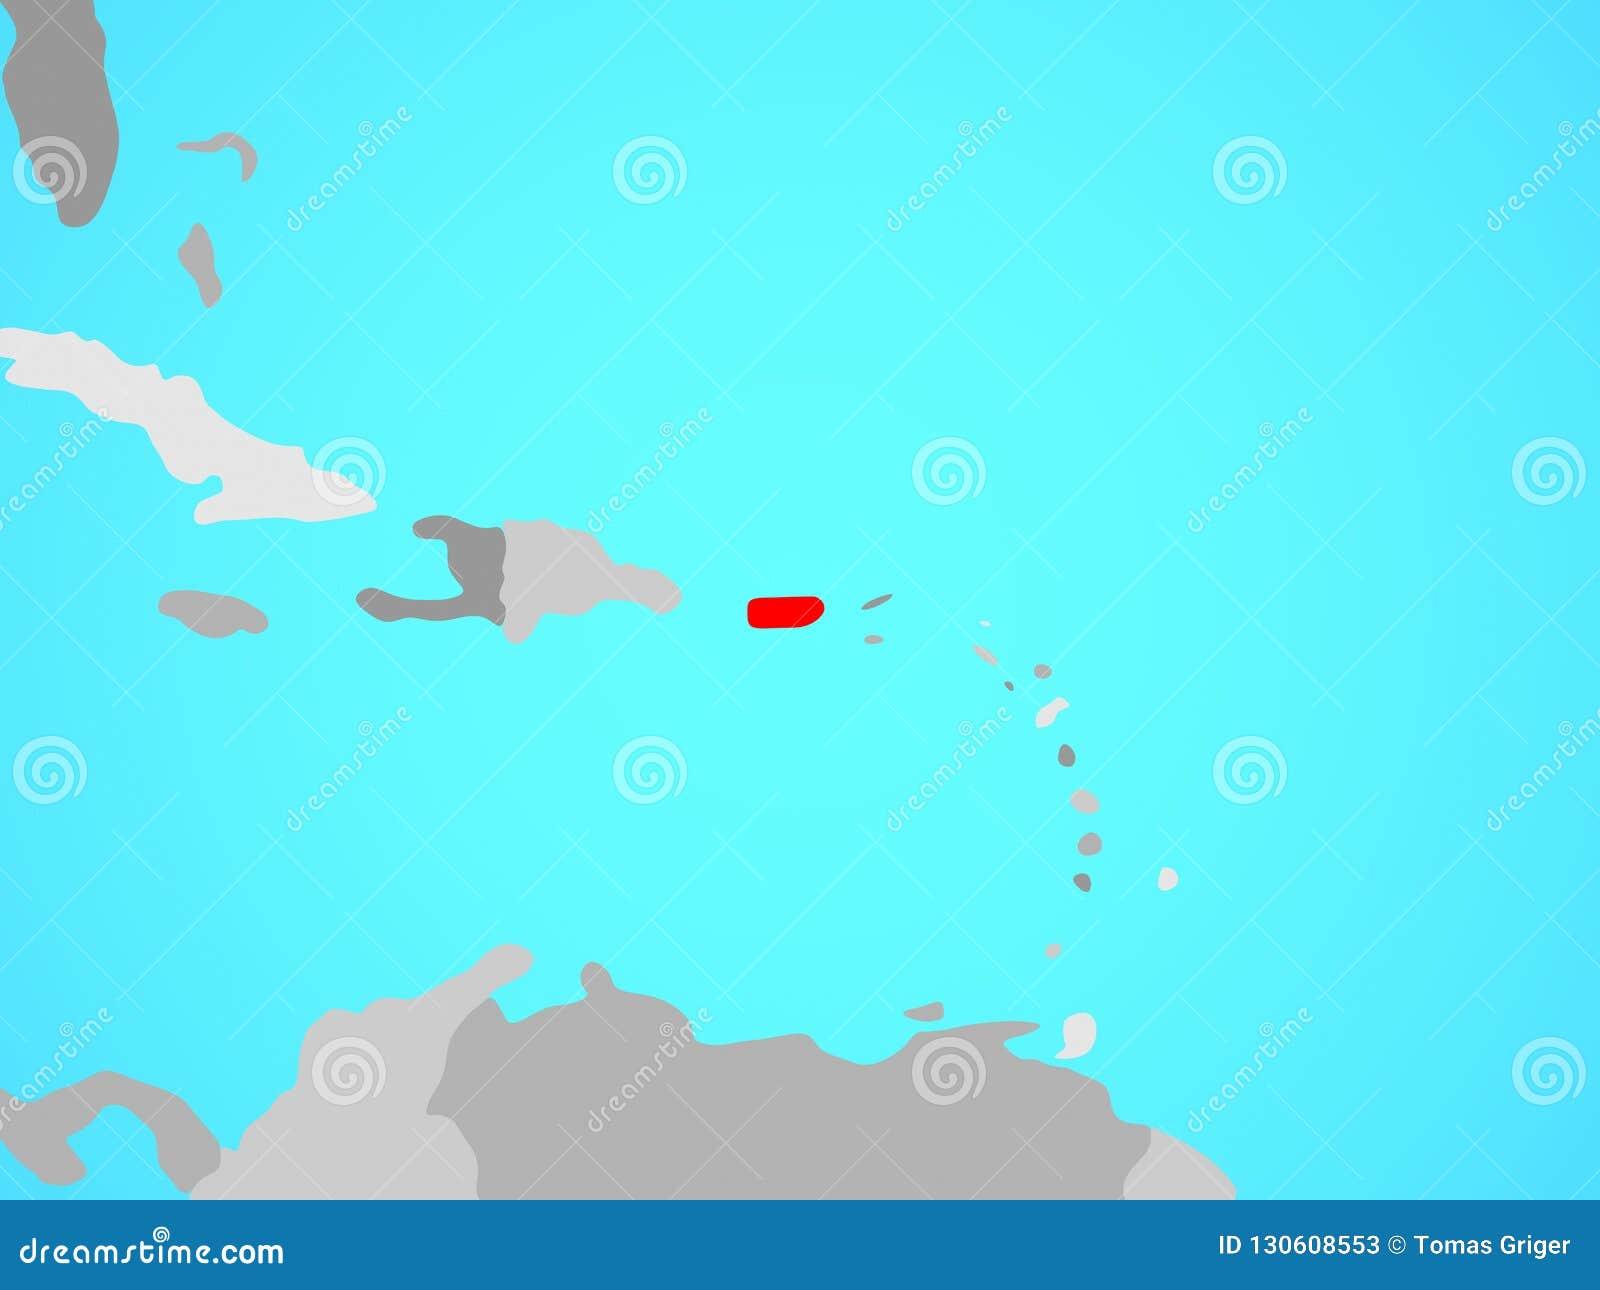 Puerto Rico On Map Stock Illustration Illustration Of Political